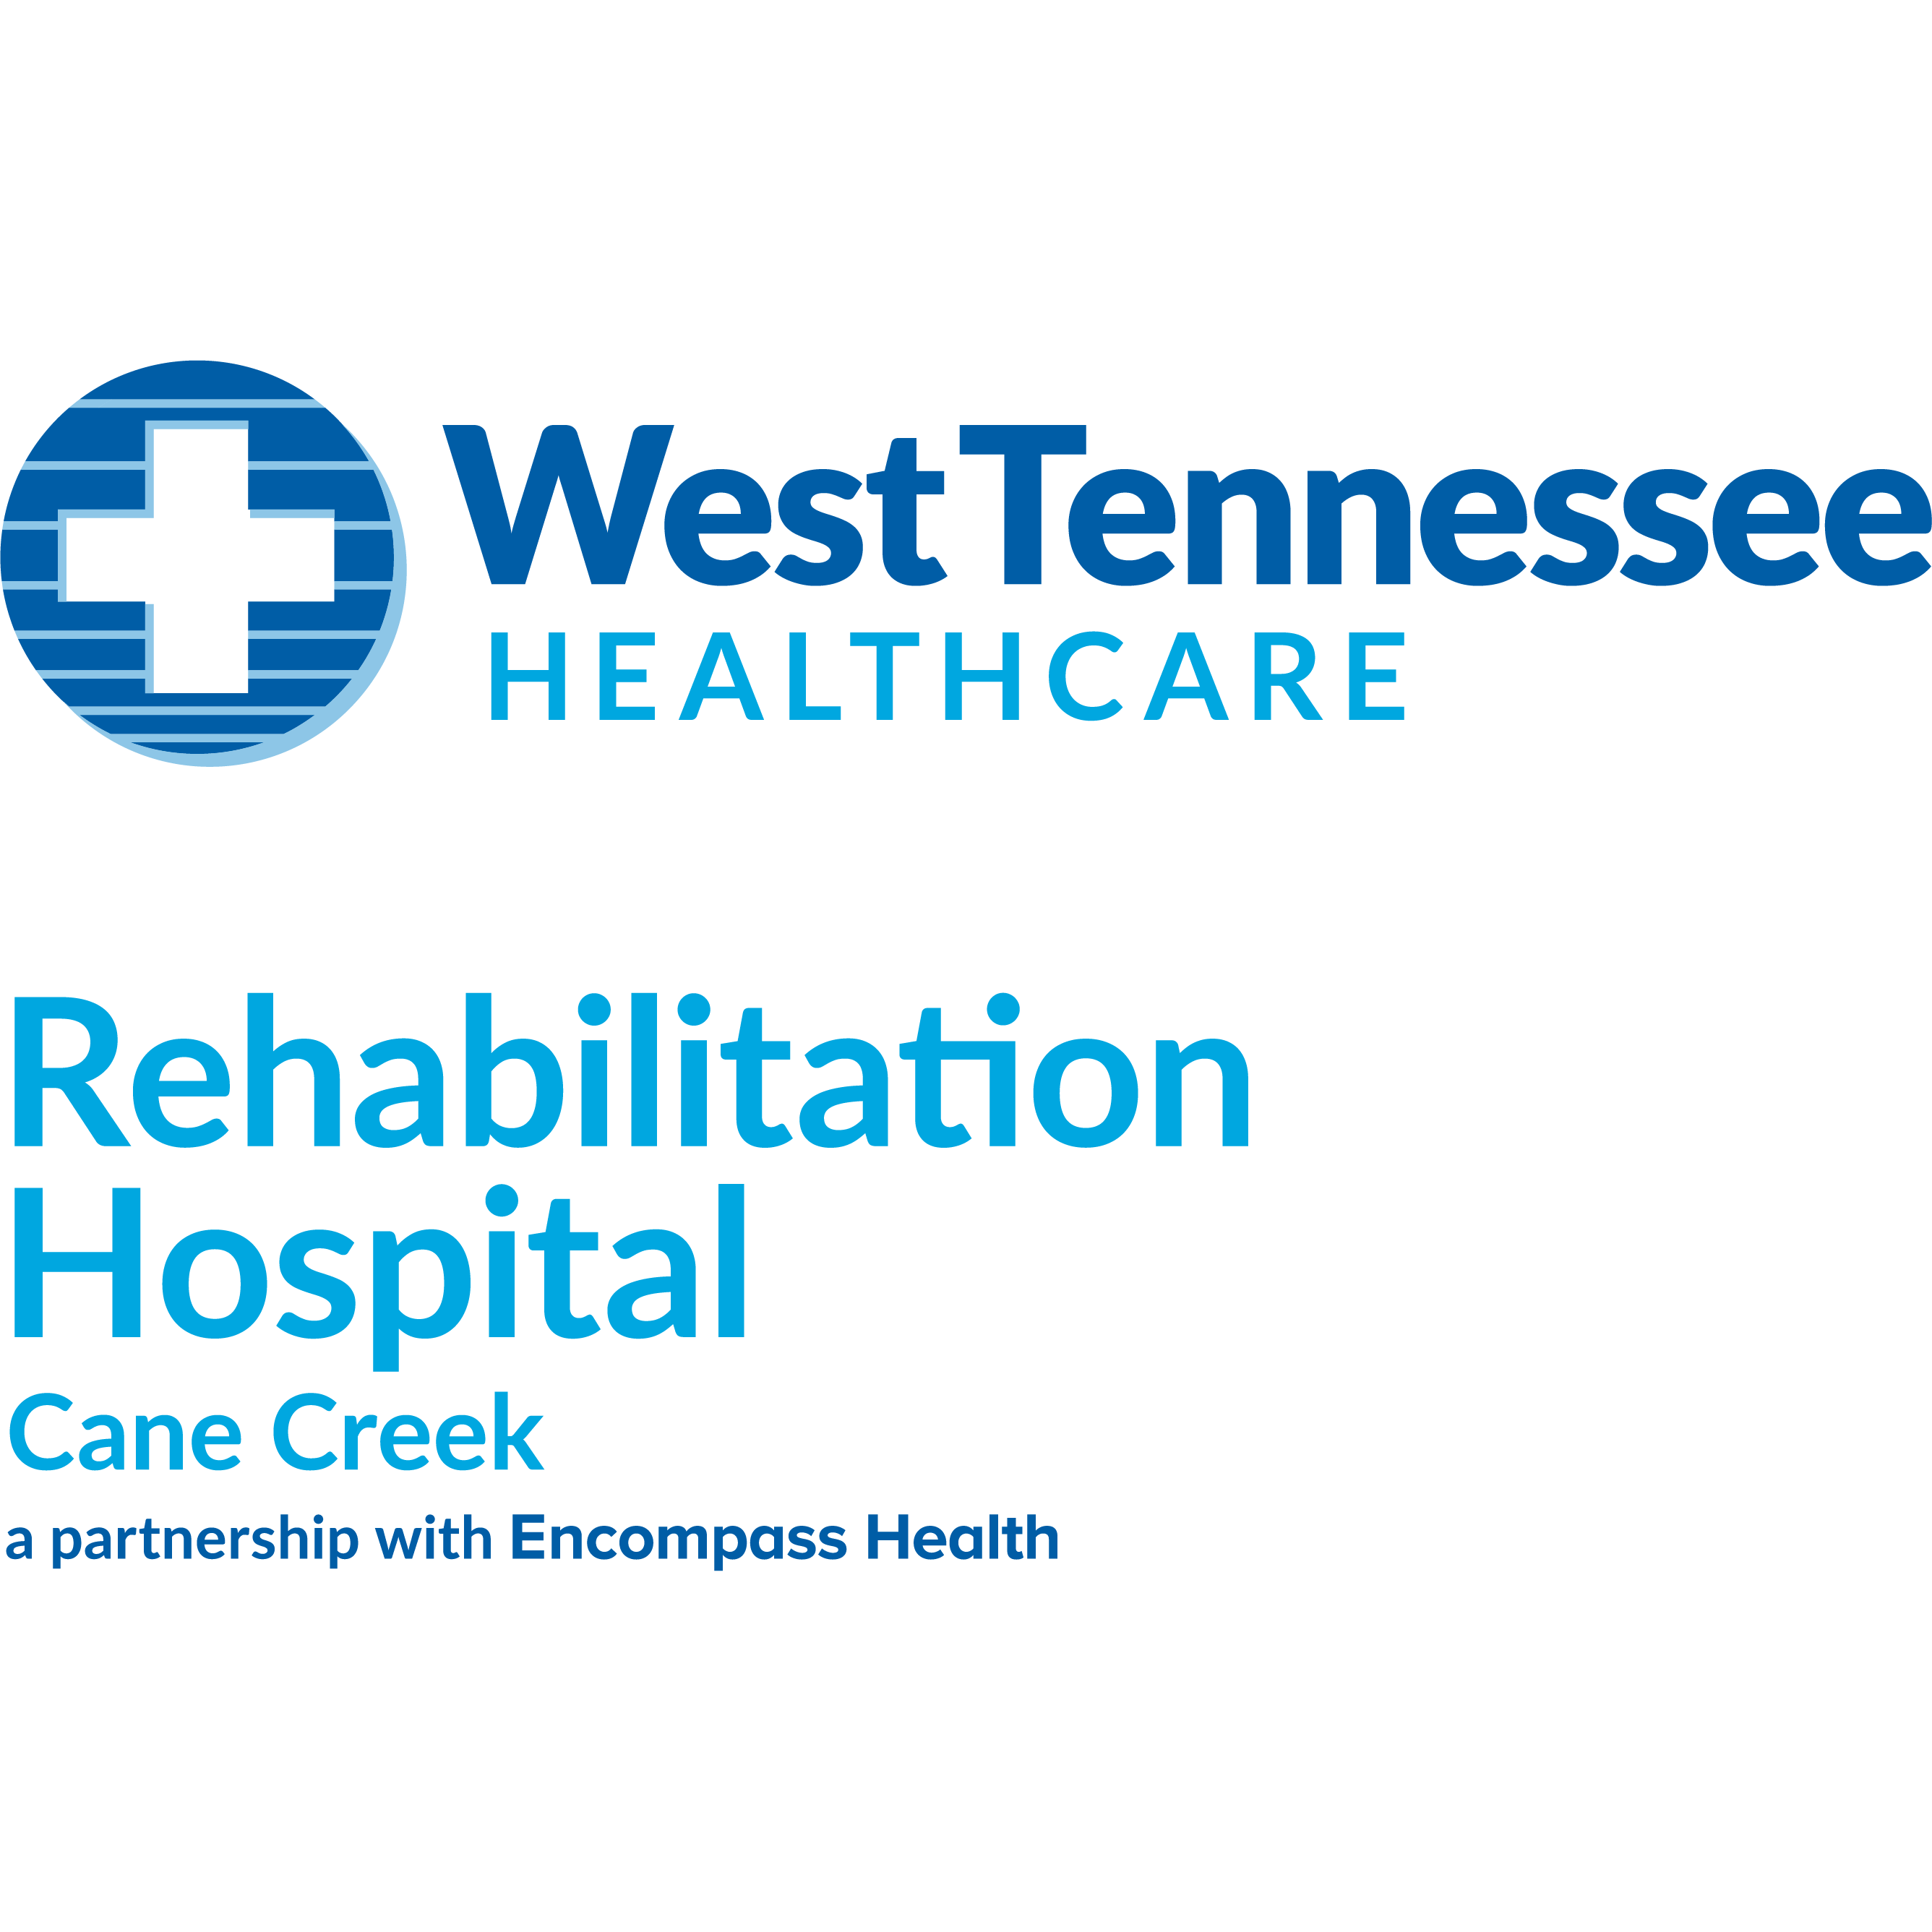 West Tennessee Healthcare Rehabilitation Hospital Cane Creek, a partnership with Encompass Health